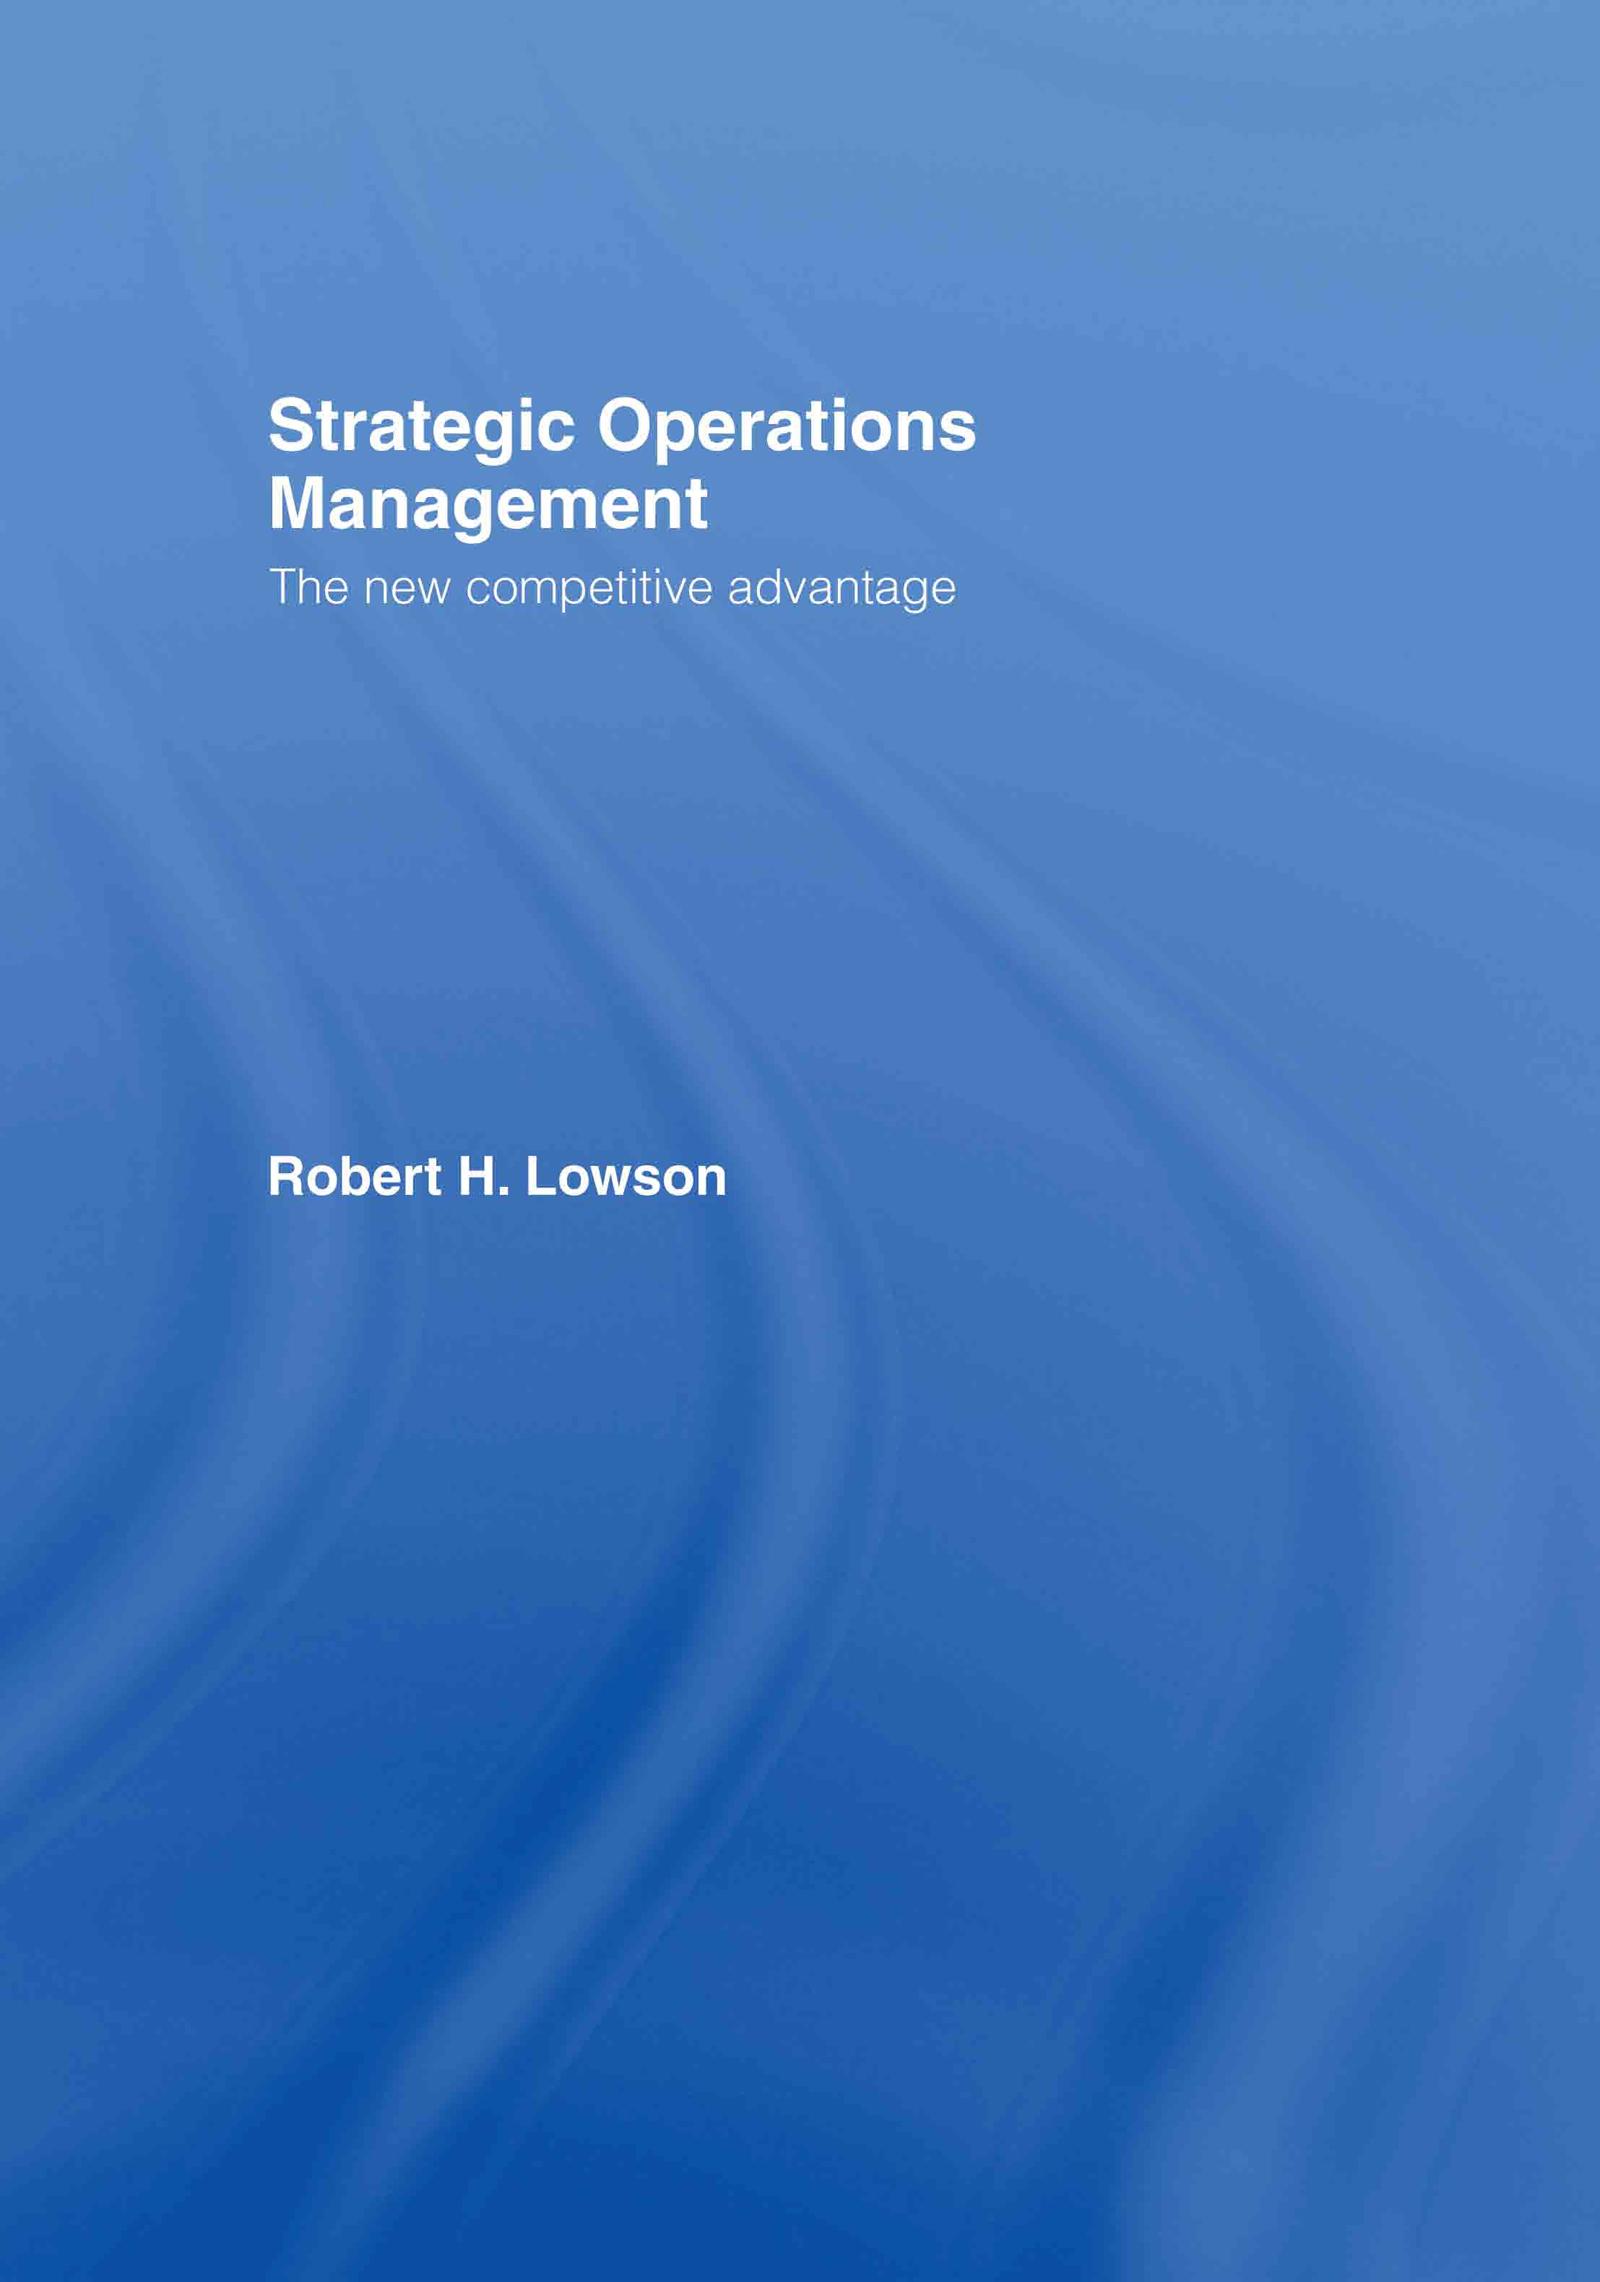 Strategic Operations Management